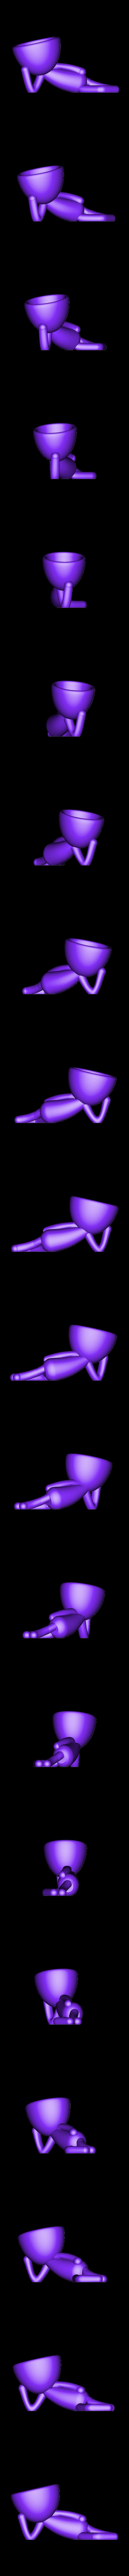 Vaso_10.stl Download free STL file JARRÓN MACETA ROBERT 10 - VASE FLOWERPOT ROBERT 10 • 3D printable object, PRODUSTL56